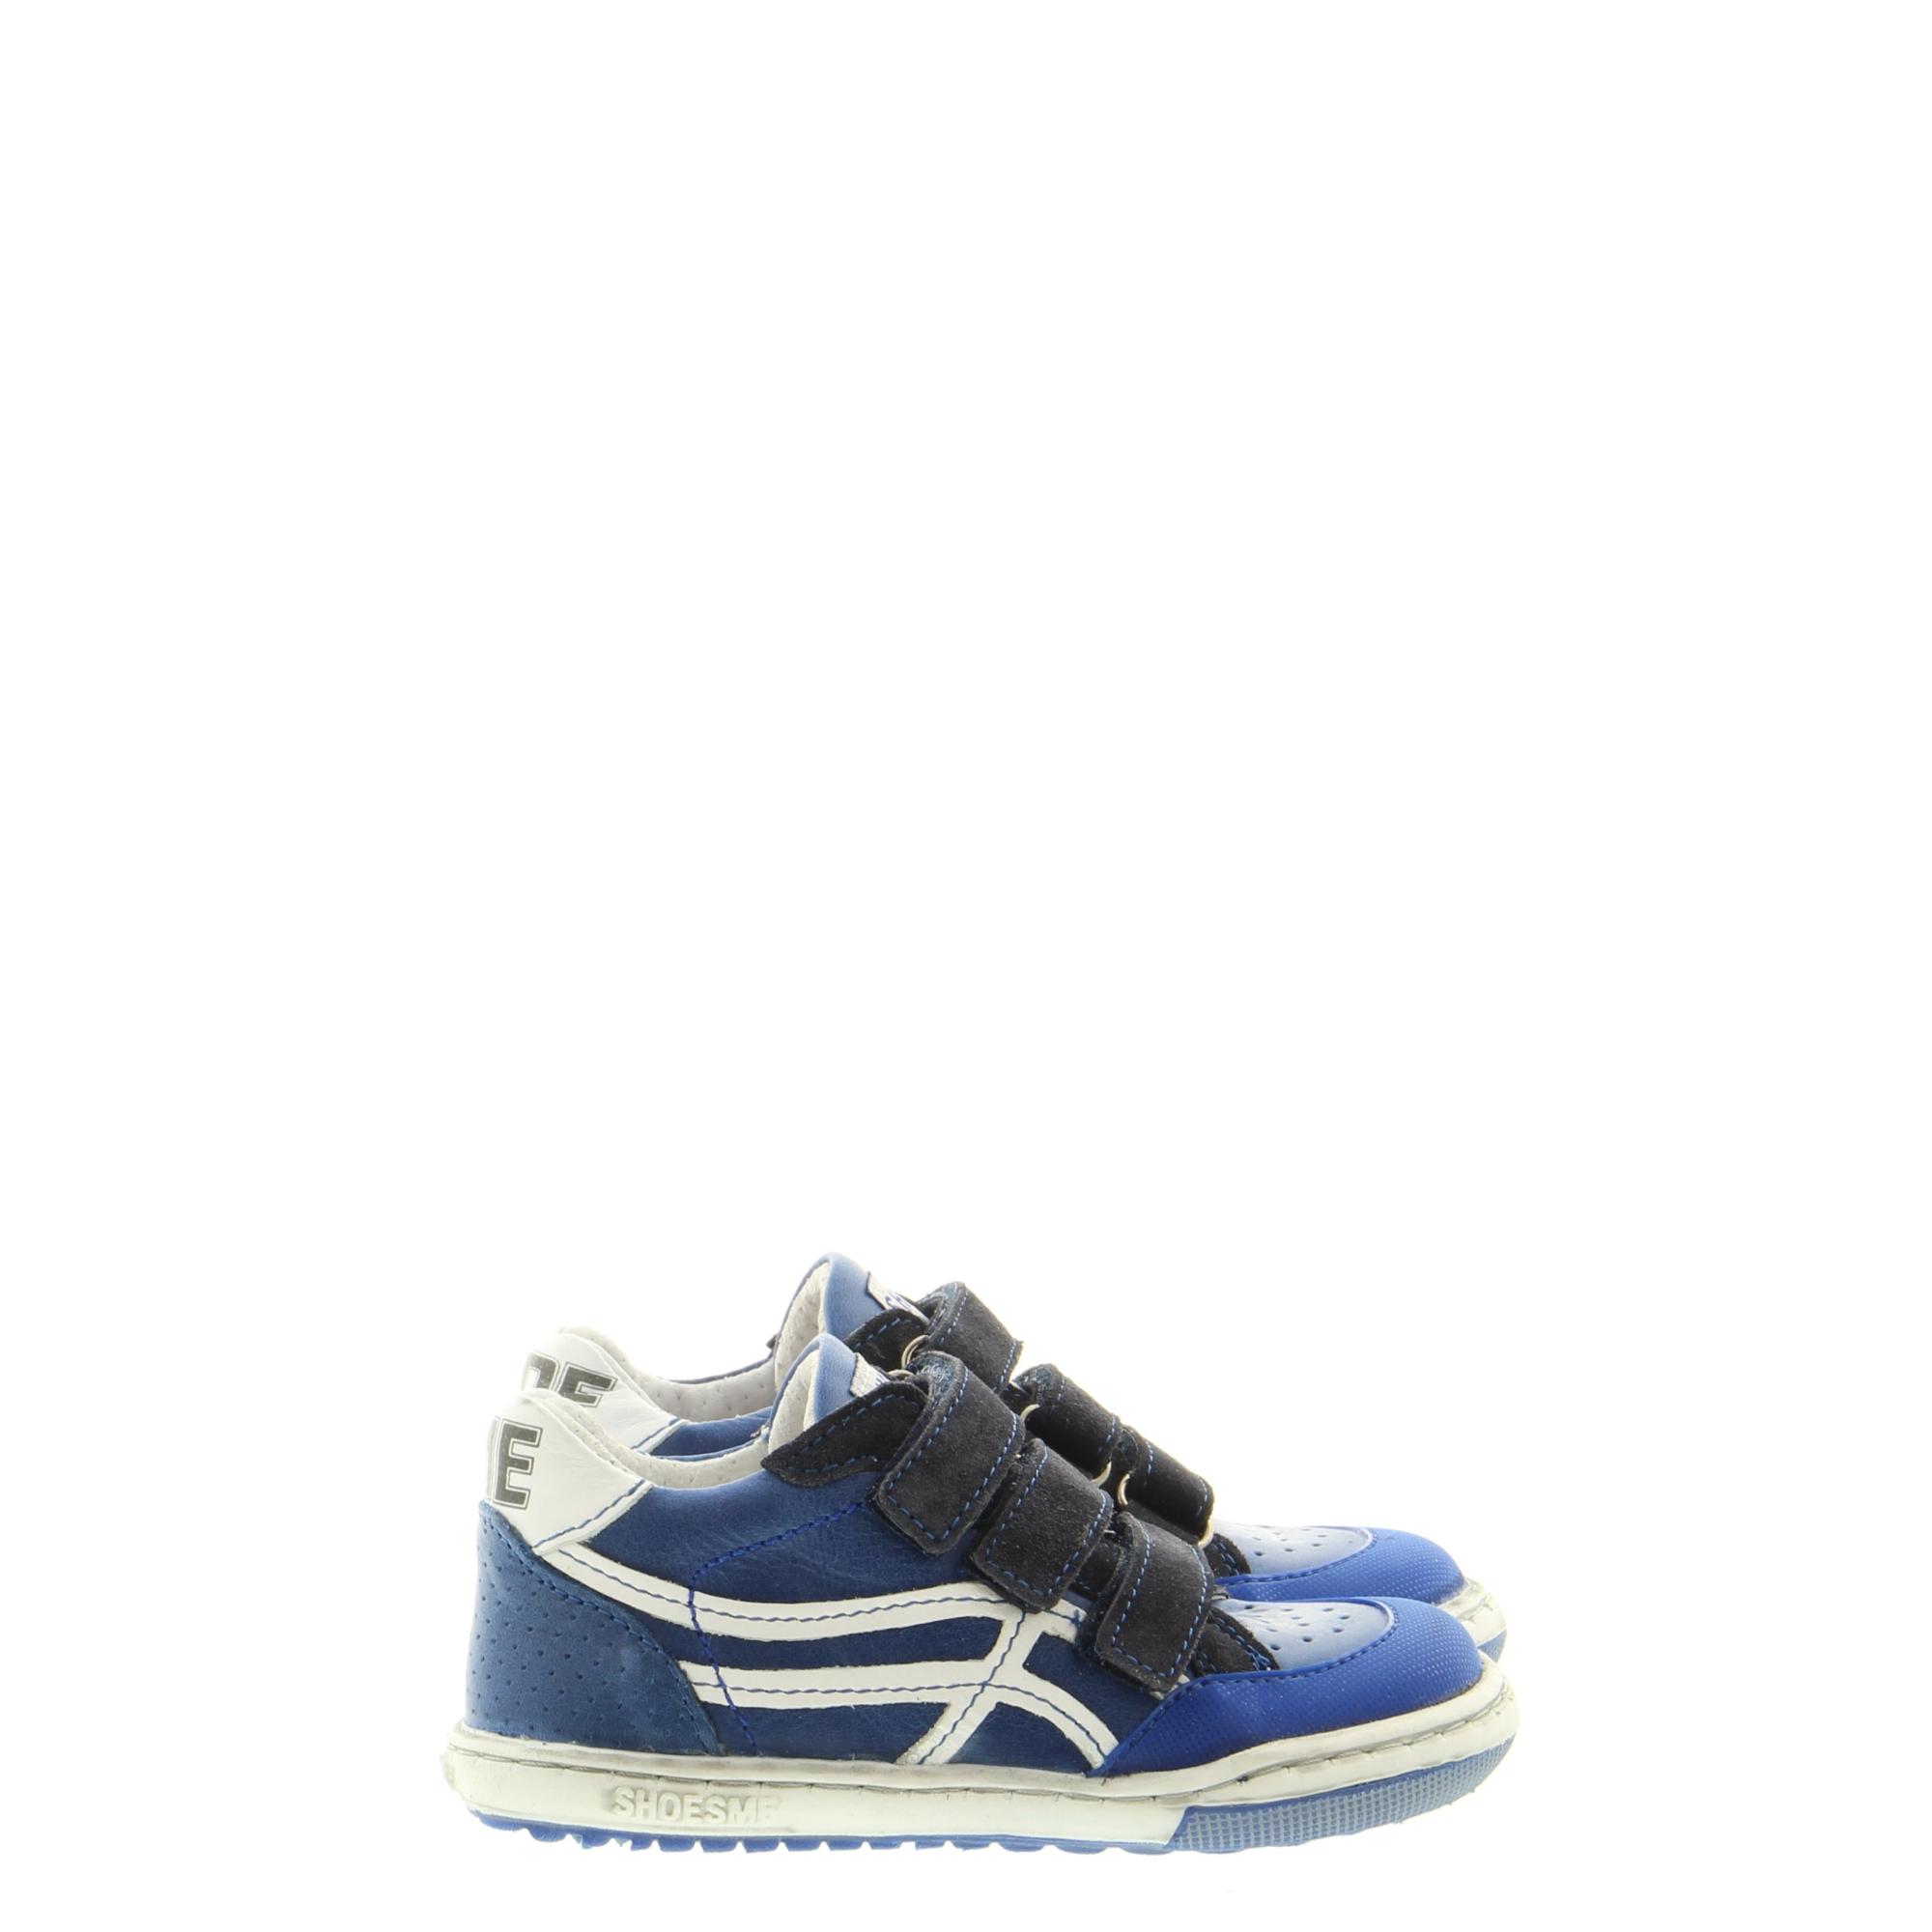 ShoesMe EF9S002-C Dk Blue